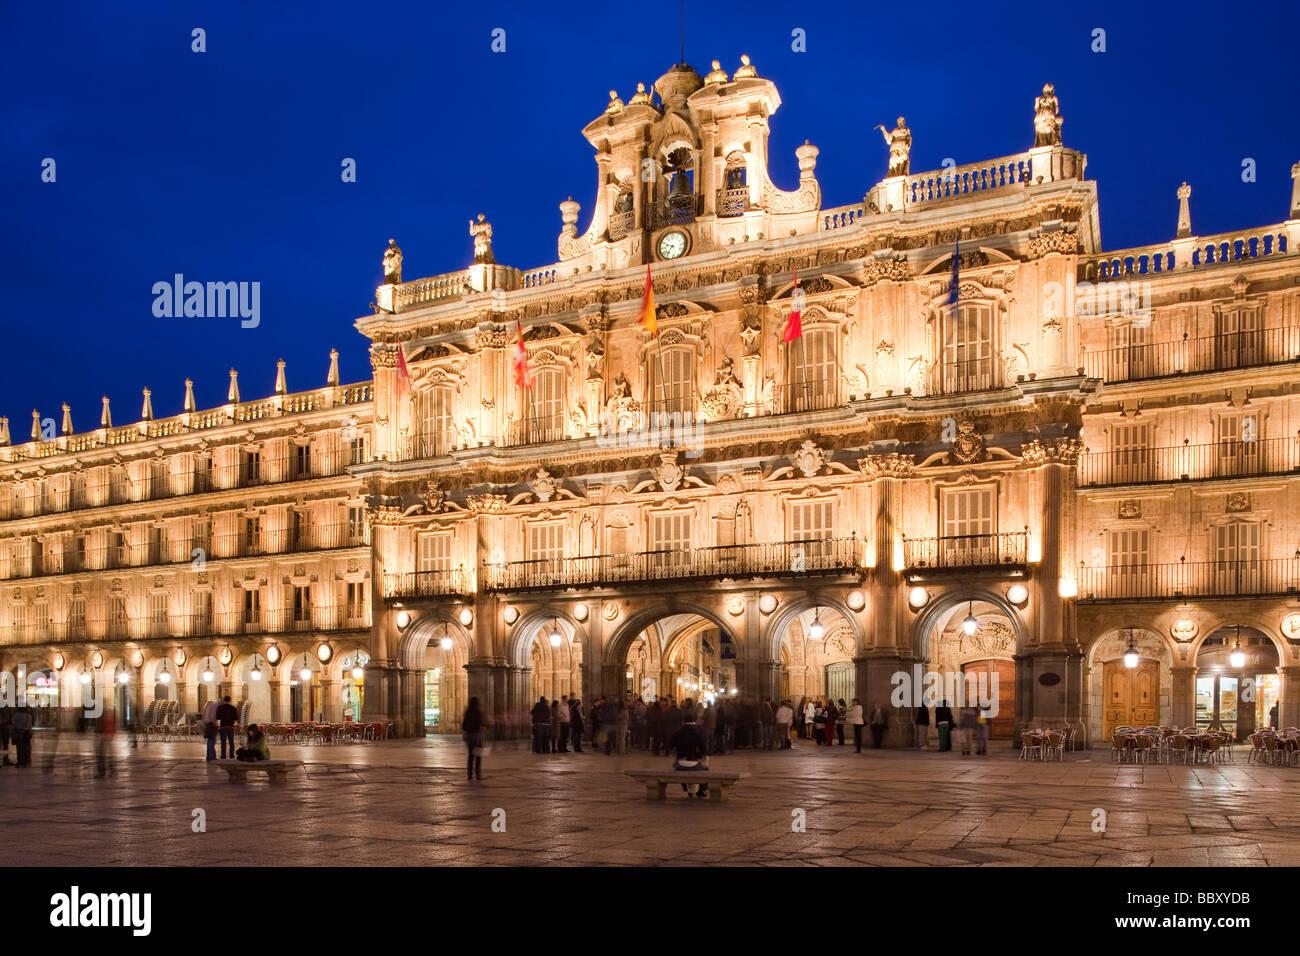 Plaza Mayor at dusk, Salamanca, Spain Stock Photo